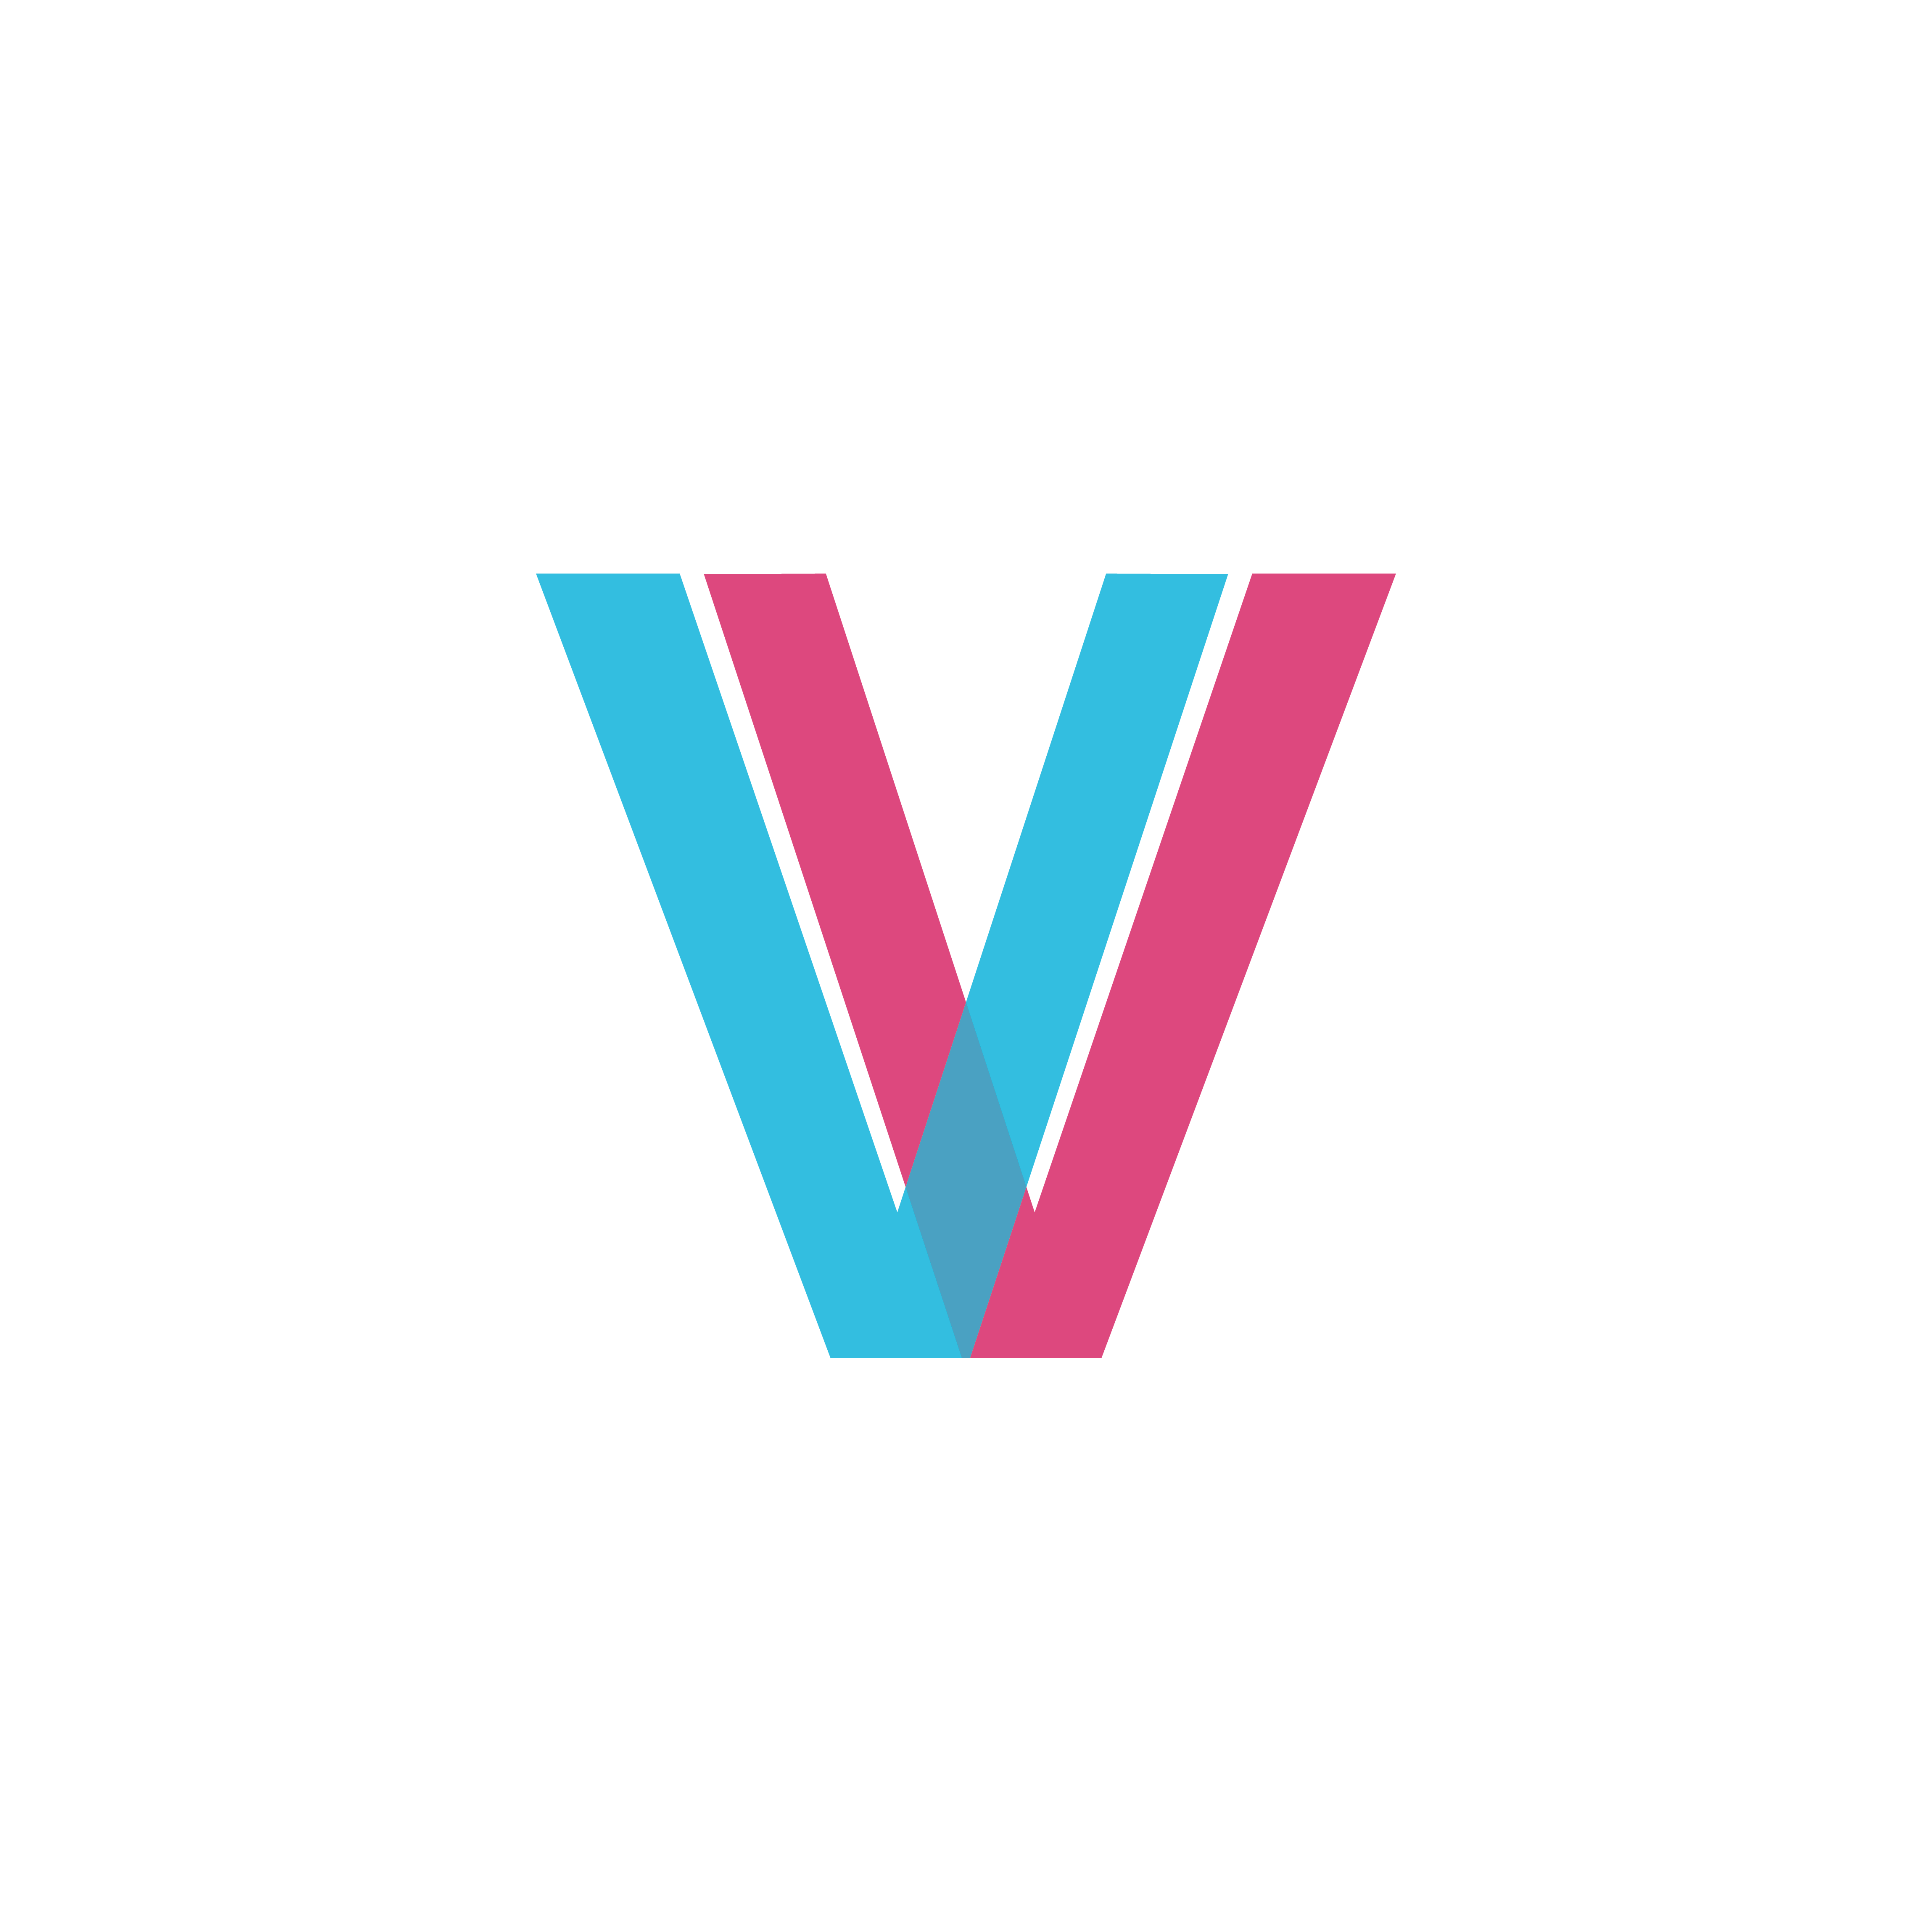 Valerie Villa